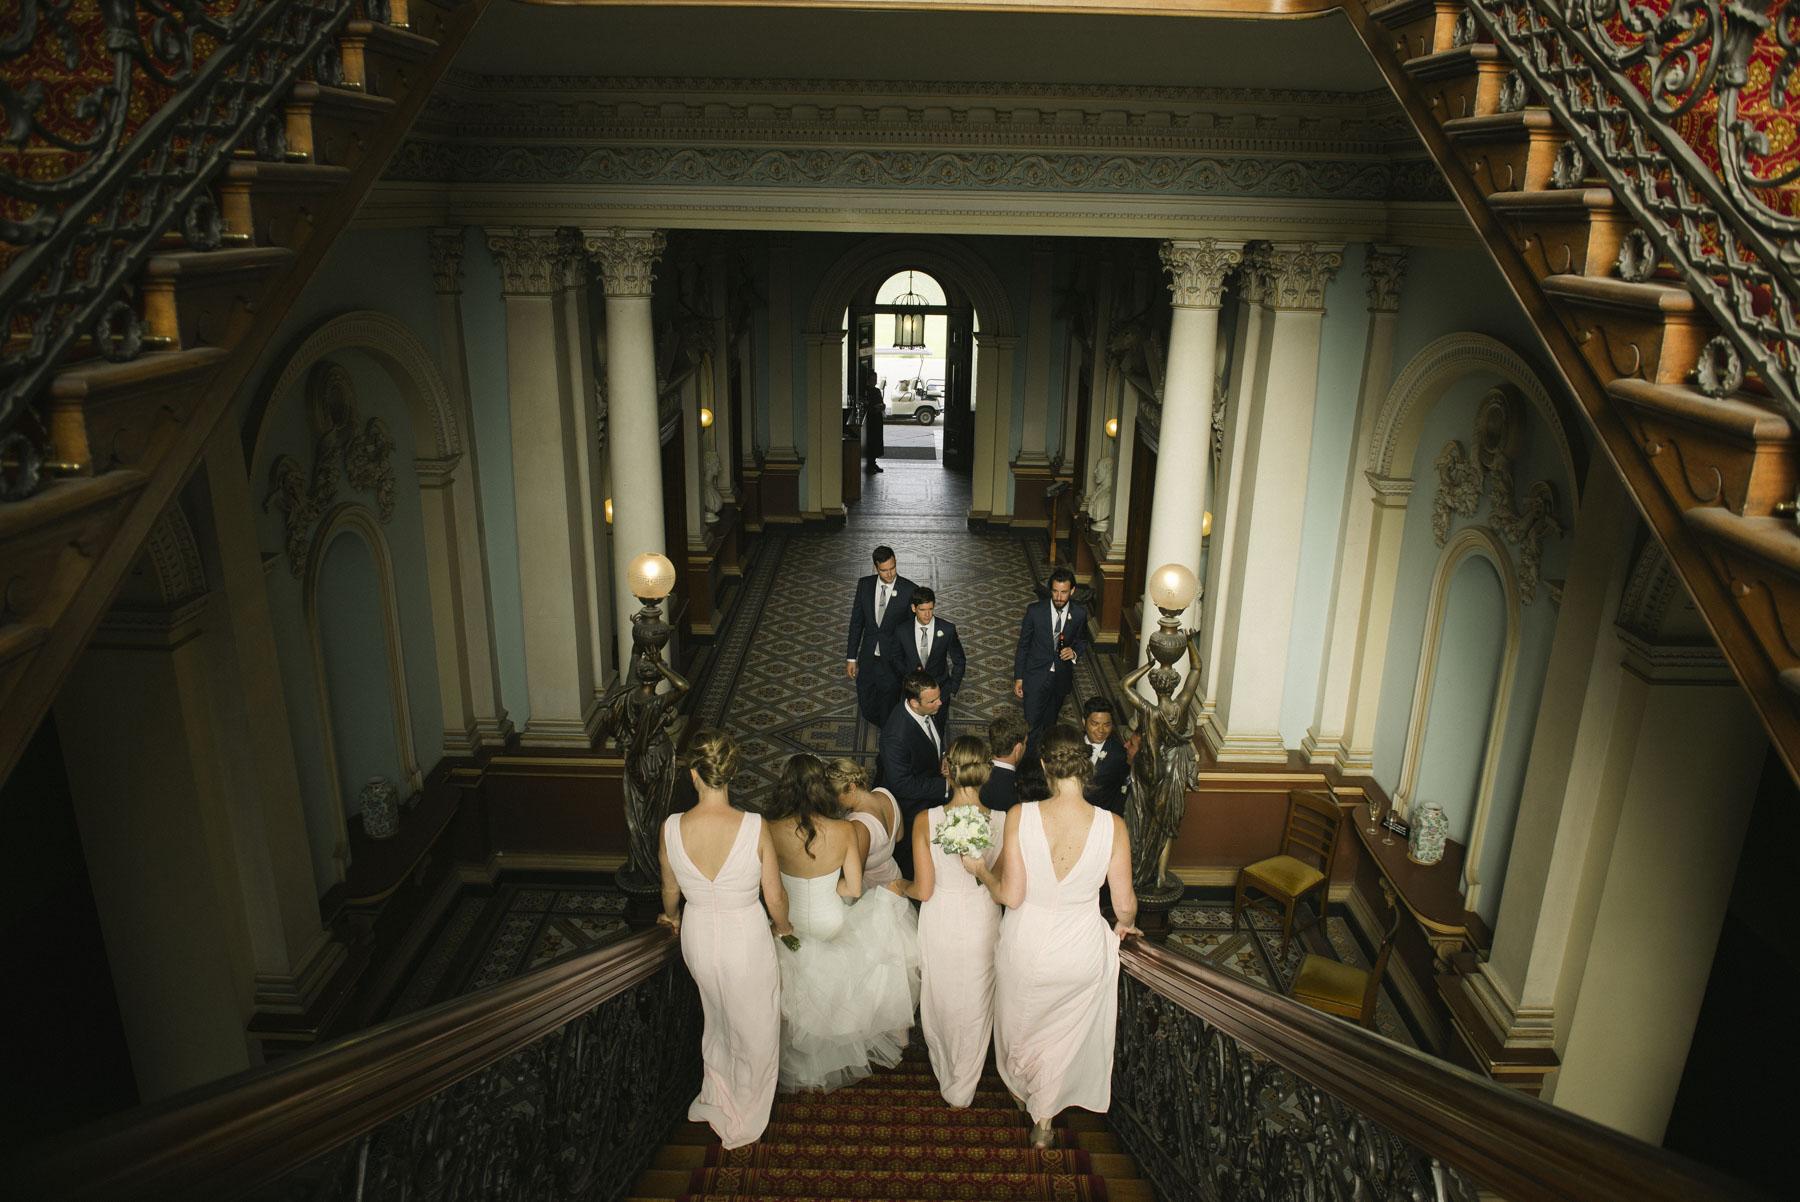 1501vand-259alan_moyle_wedding_portrait_brighton_bayside_werribee_estate_mansion_zoo_rustic_styled_garden_mansion_candid_documentry_victoria_whitelaw.jpg